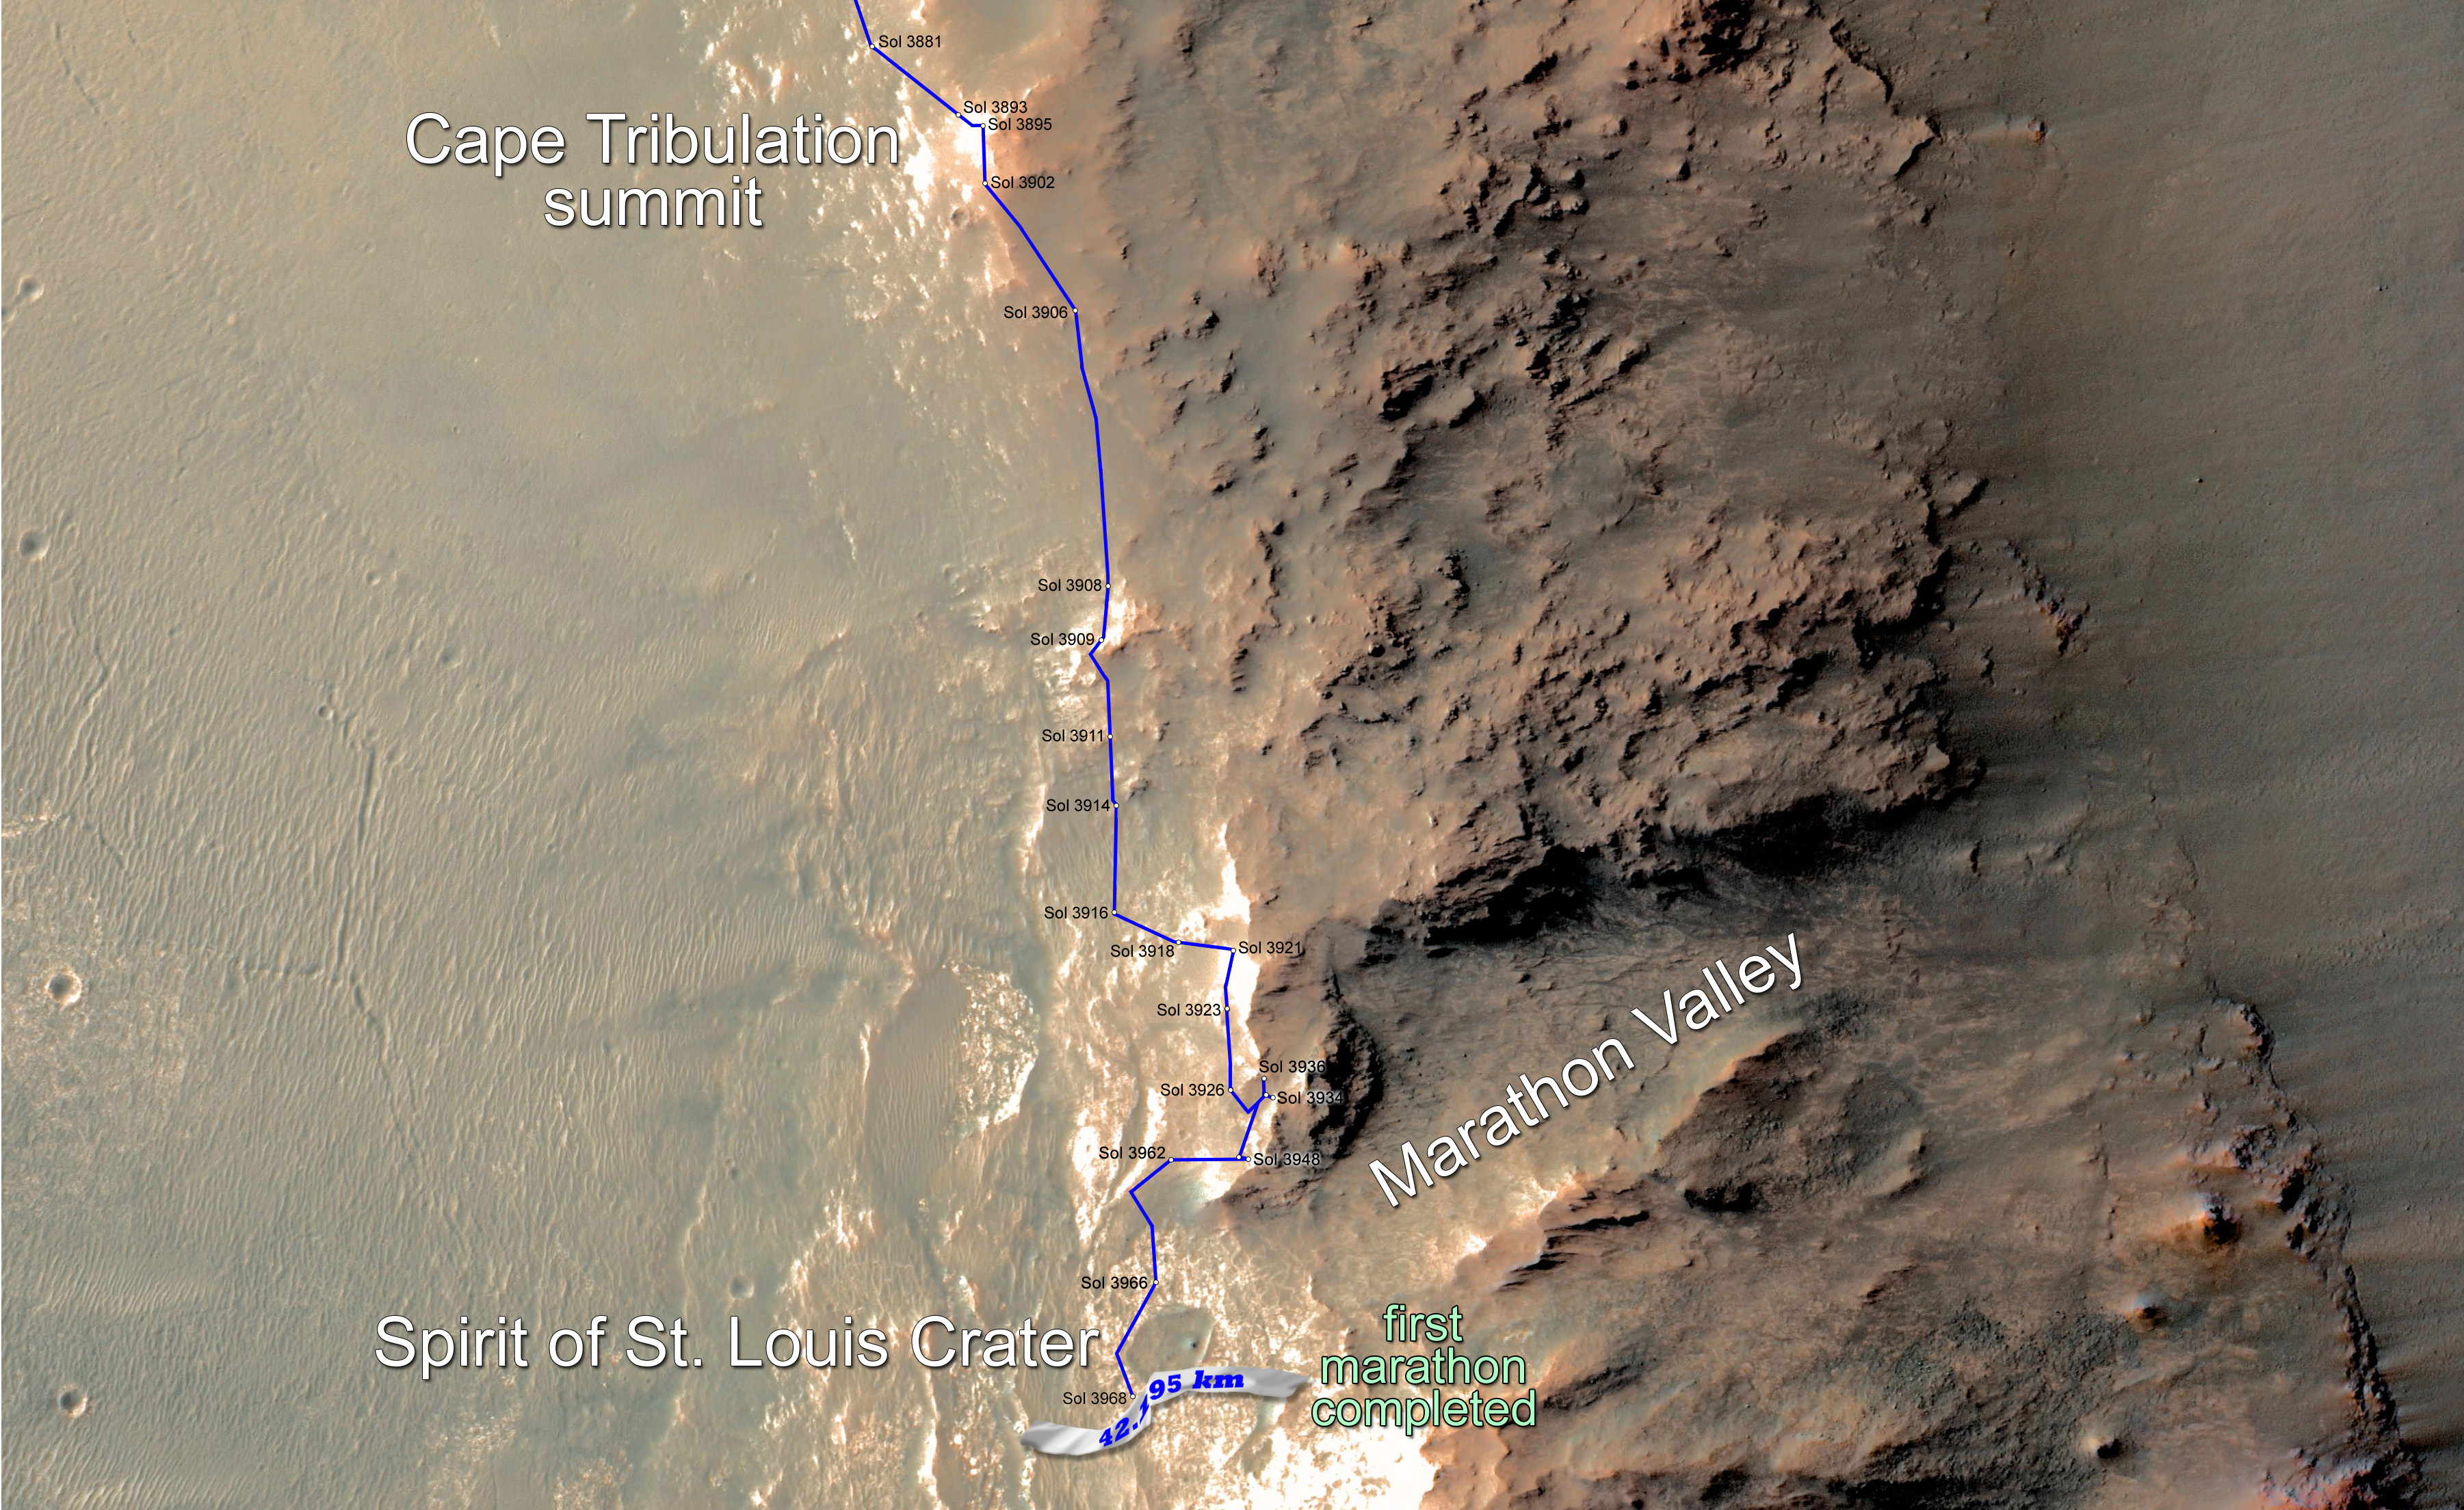 15 03 24 mars-rover-opportunity-marathon-map-PIA19157